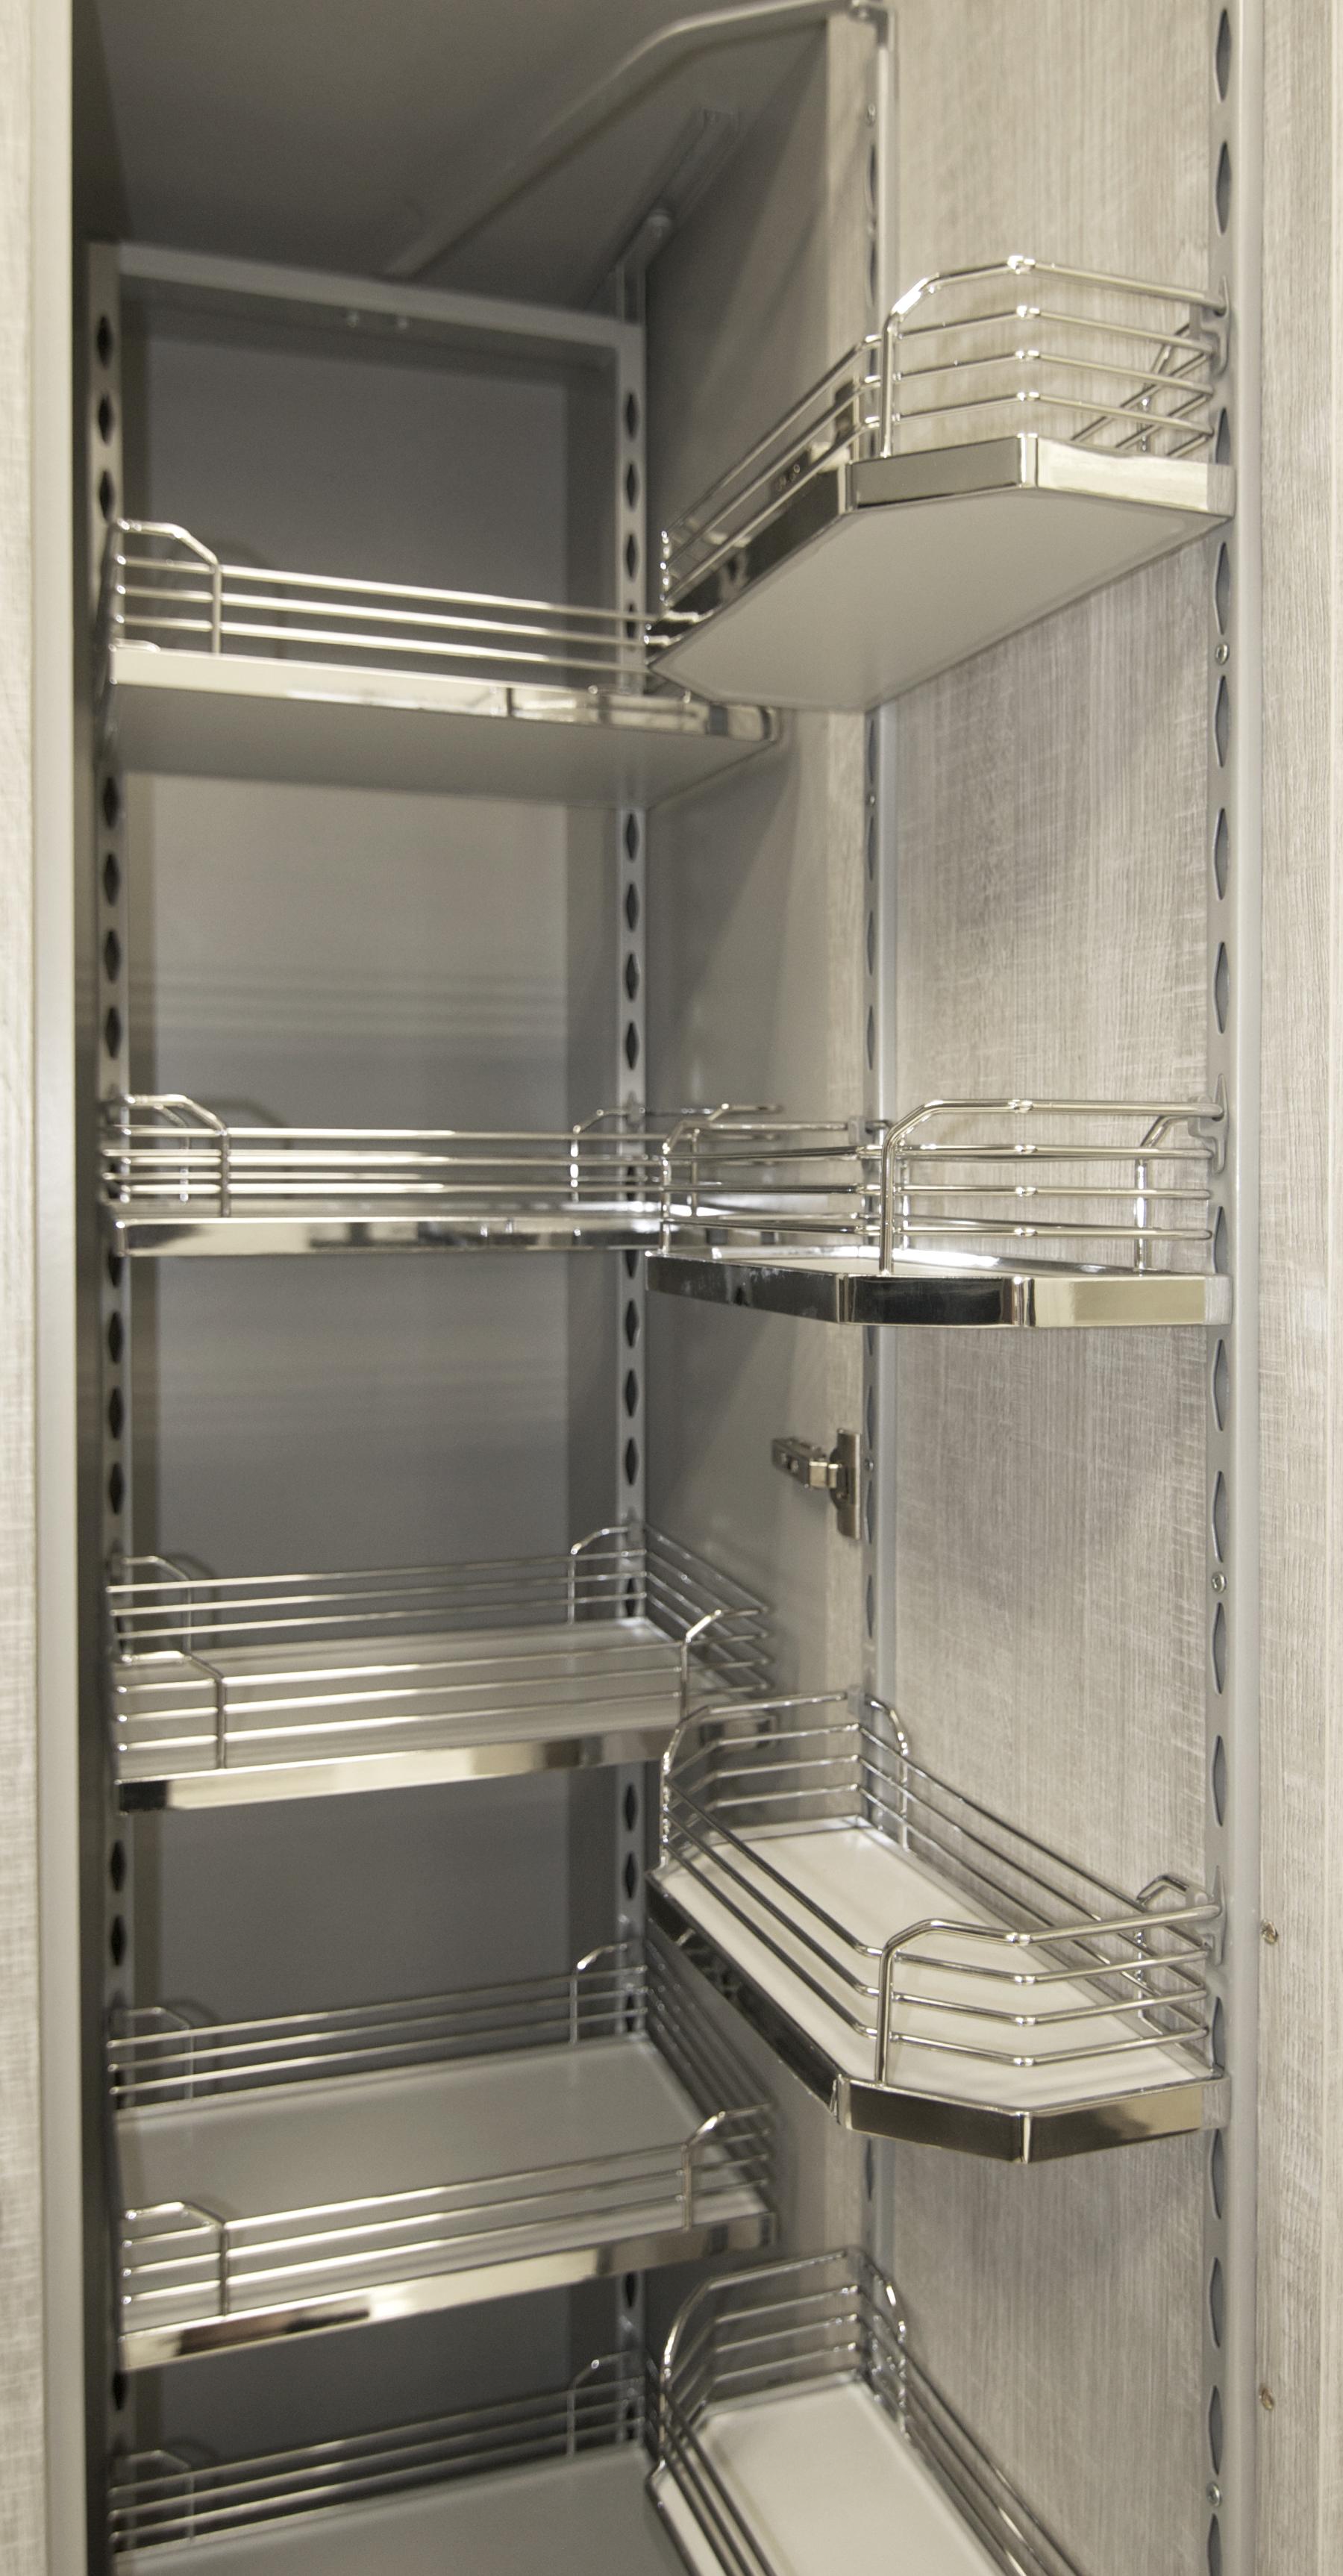 Cabinetry Storage Option